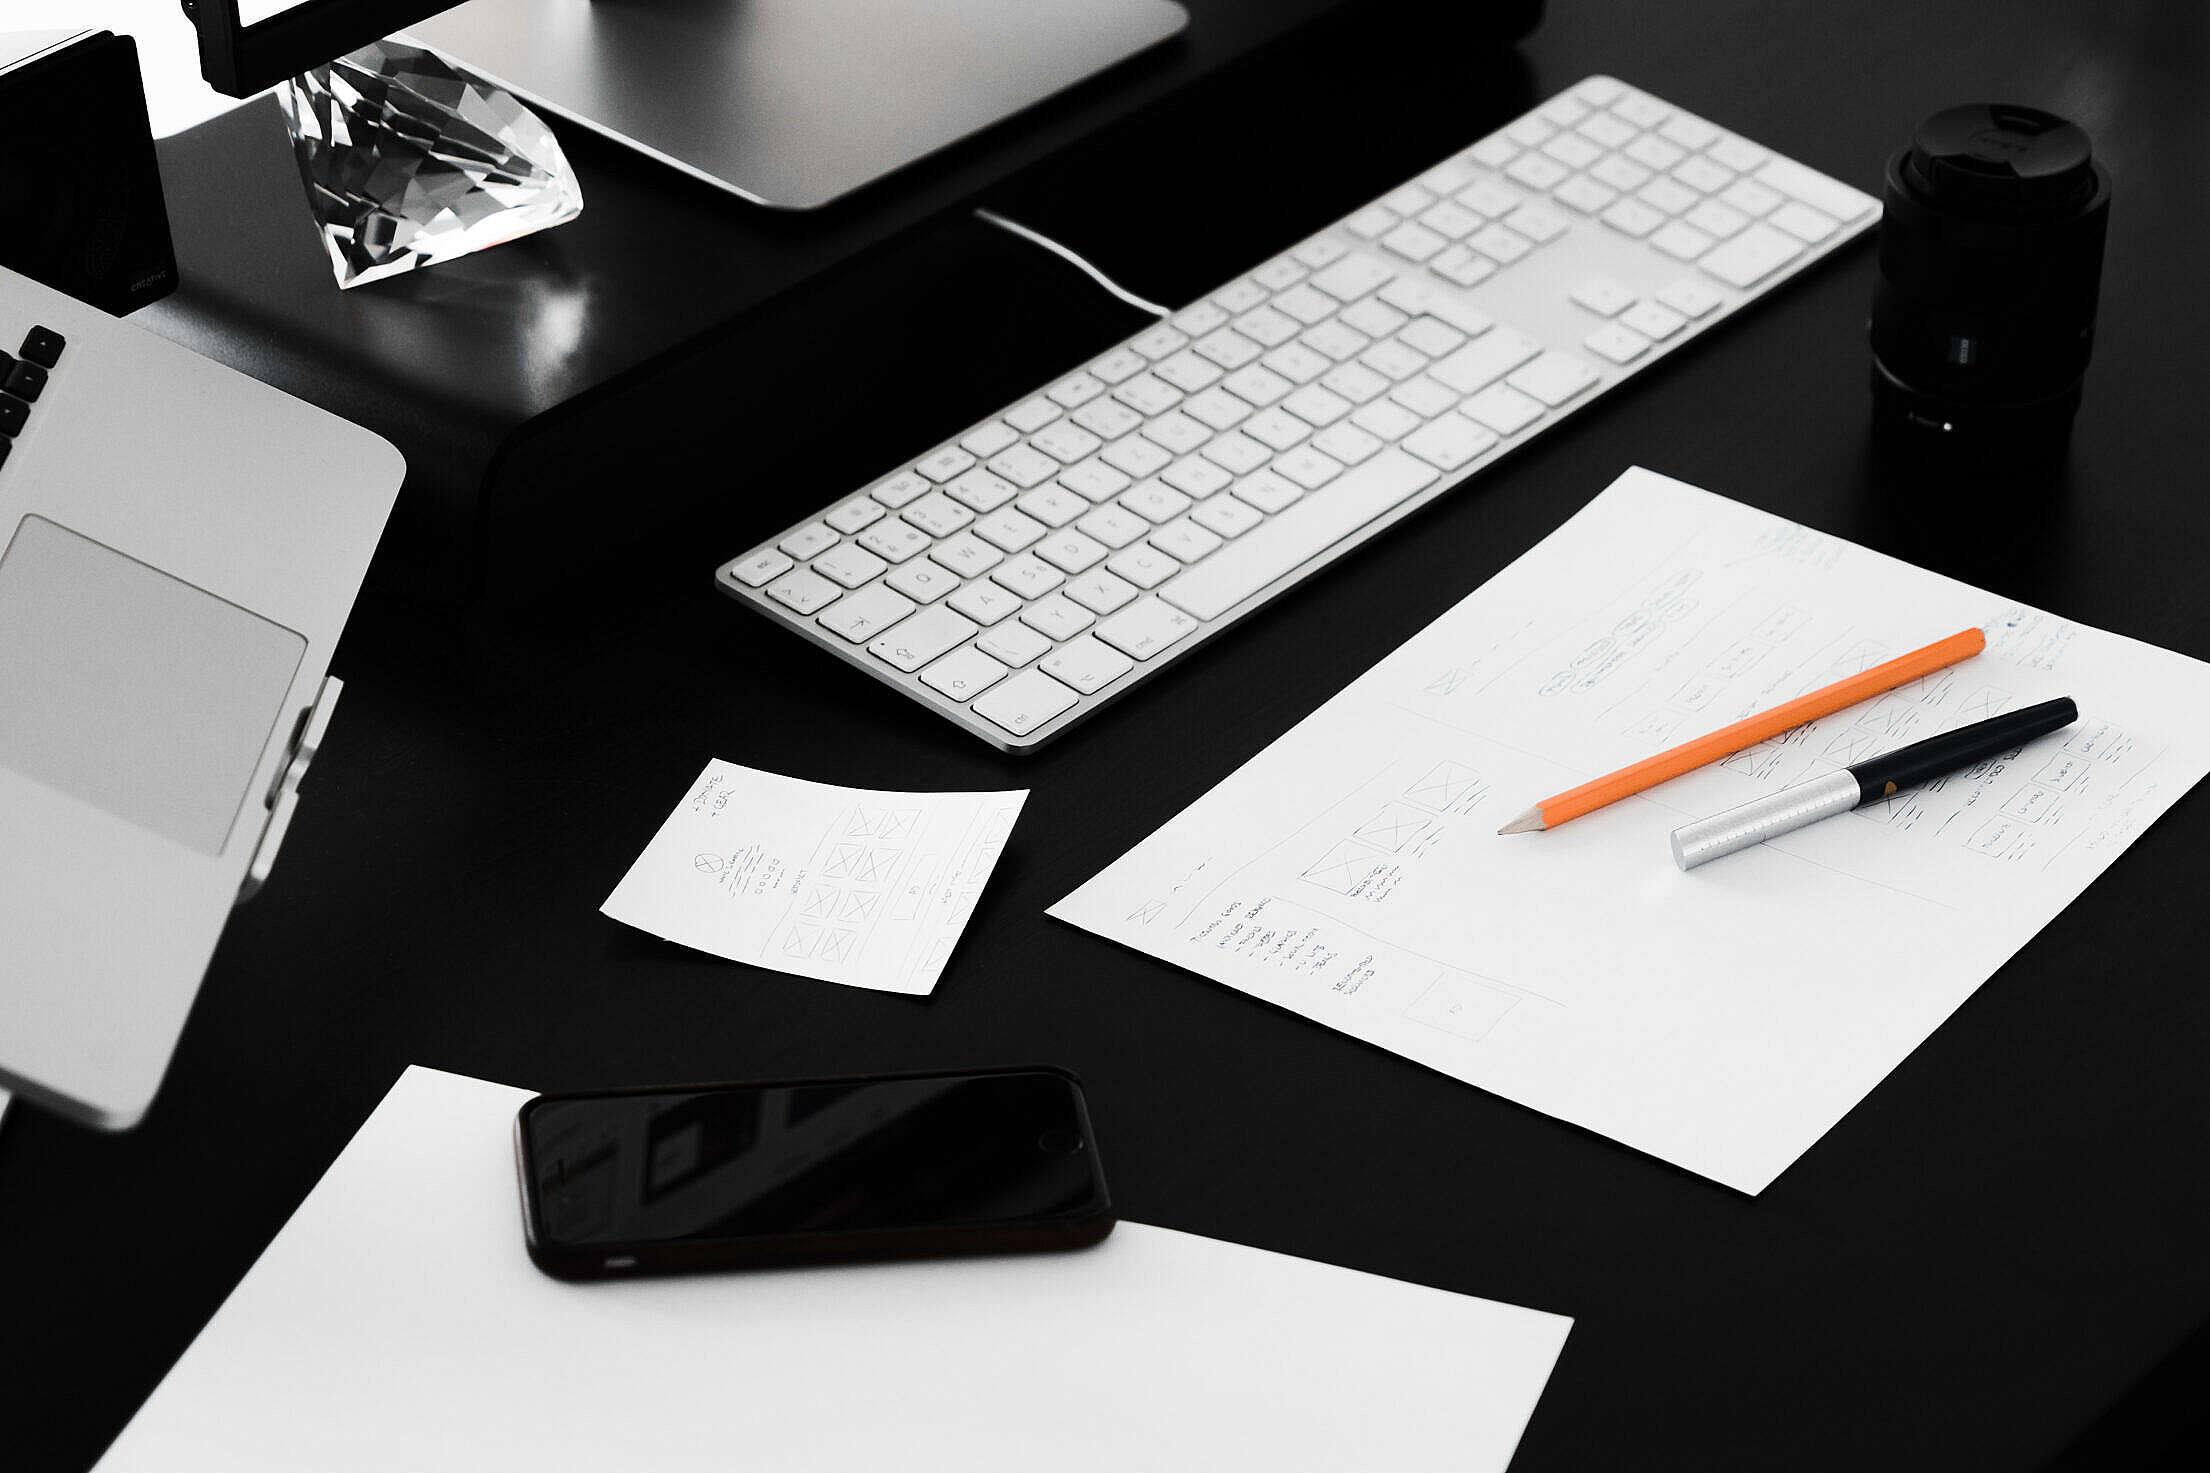 Busy Web Designer Minimalist Workplace Desk Free Stock Photo